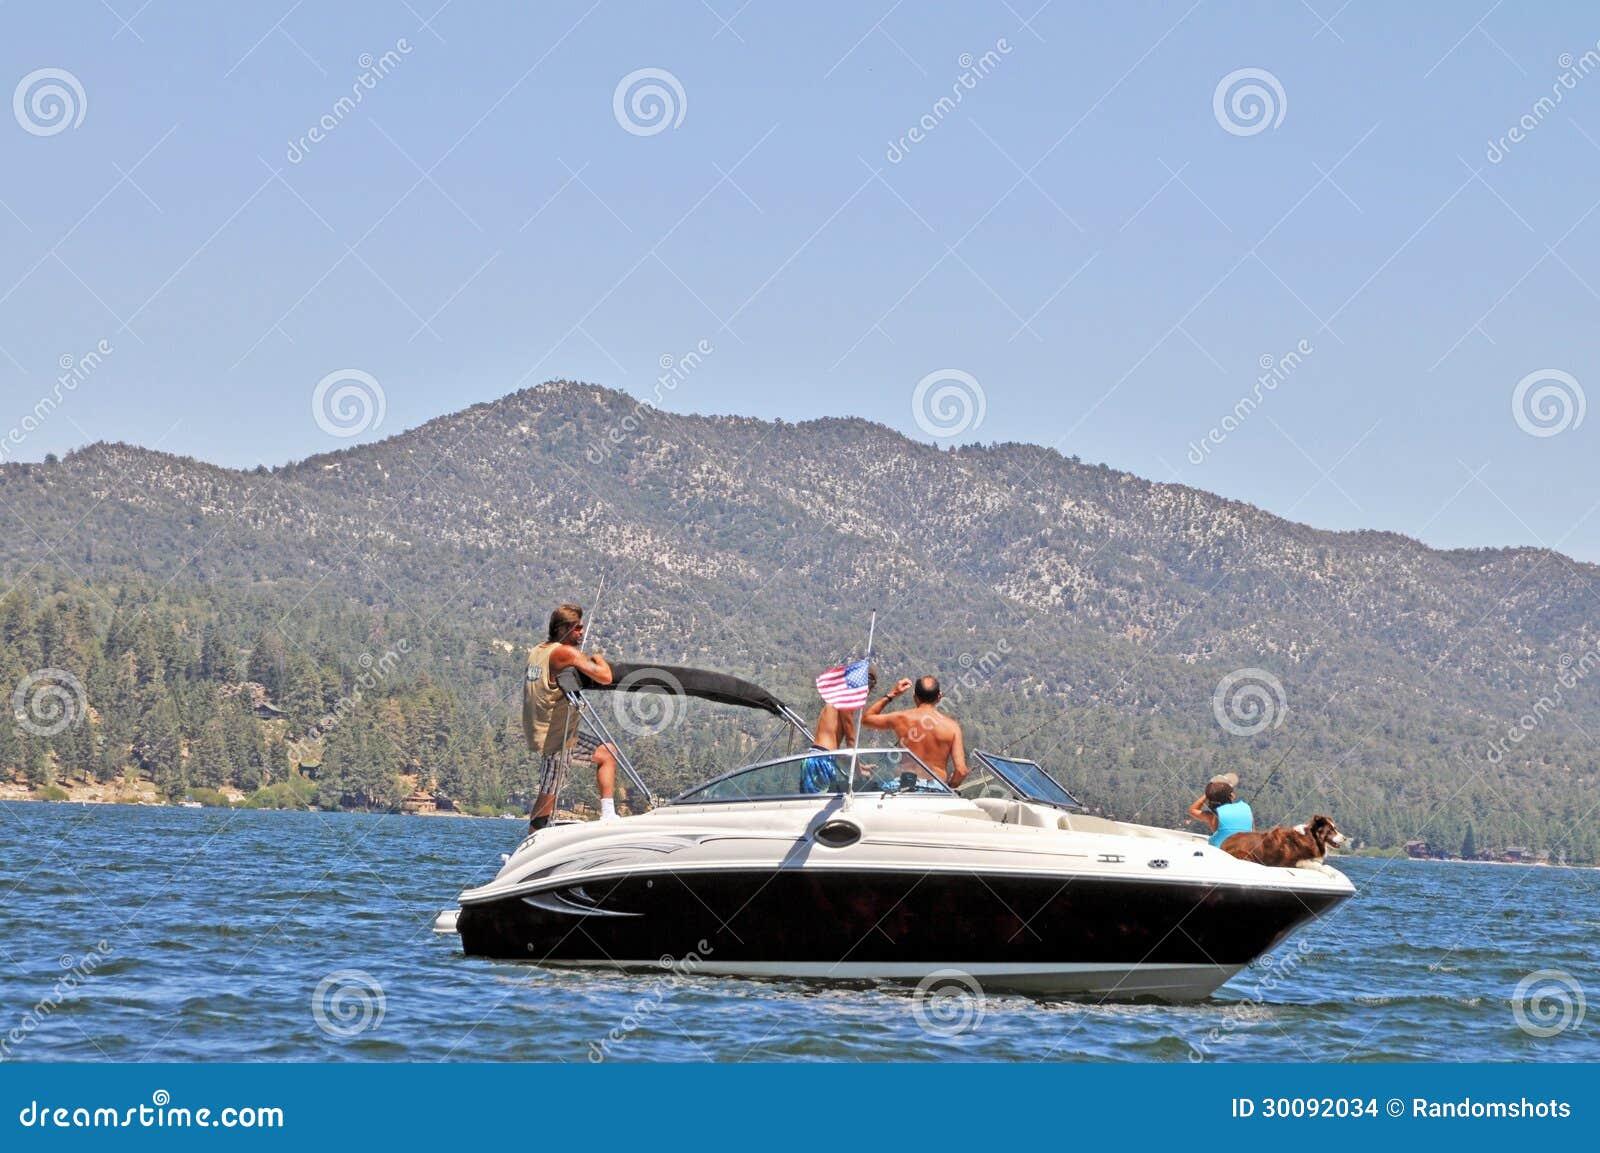 Fishing expedition editorial stock image image 30092034 for Big bear lake fishing report